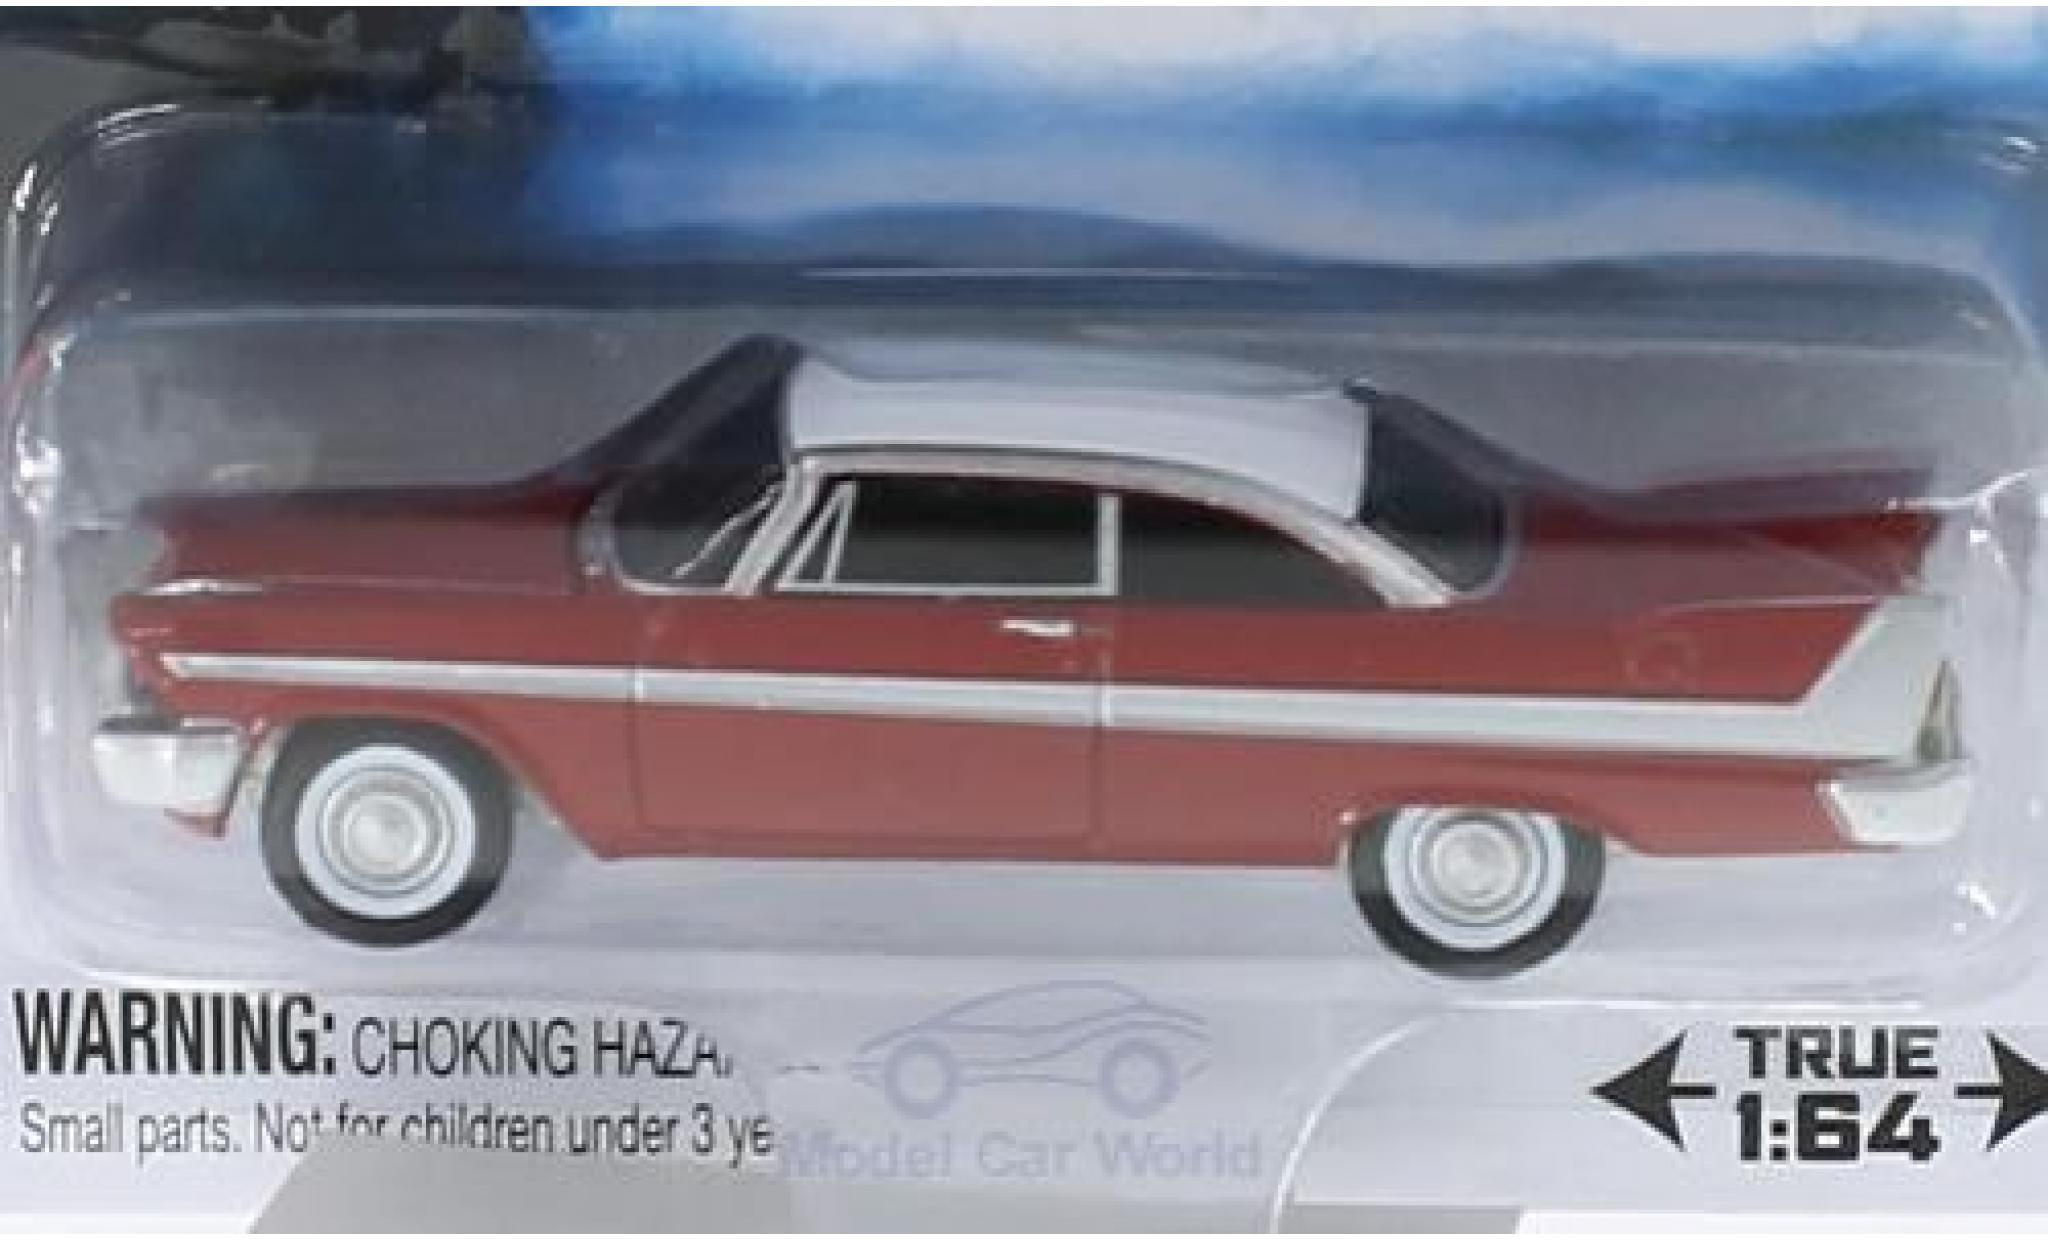 Plymouth Fury 1/64 Auto World rouge/blanche Der Horrorfilm Christine 1958 SilverScreen Moviecar